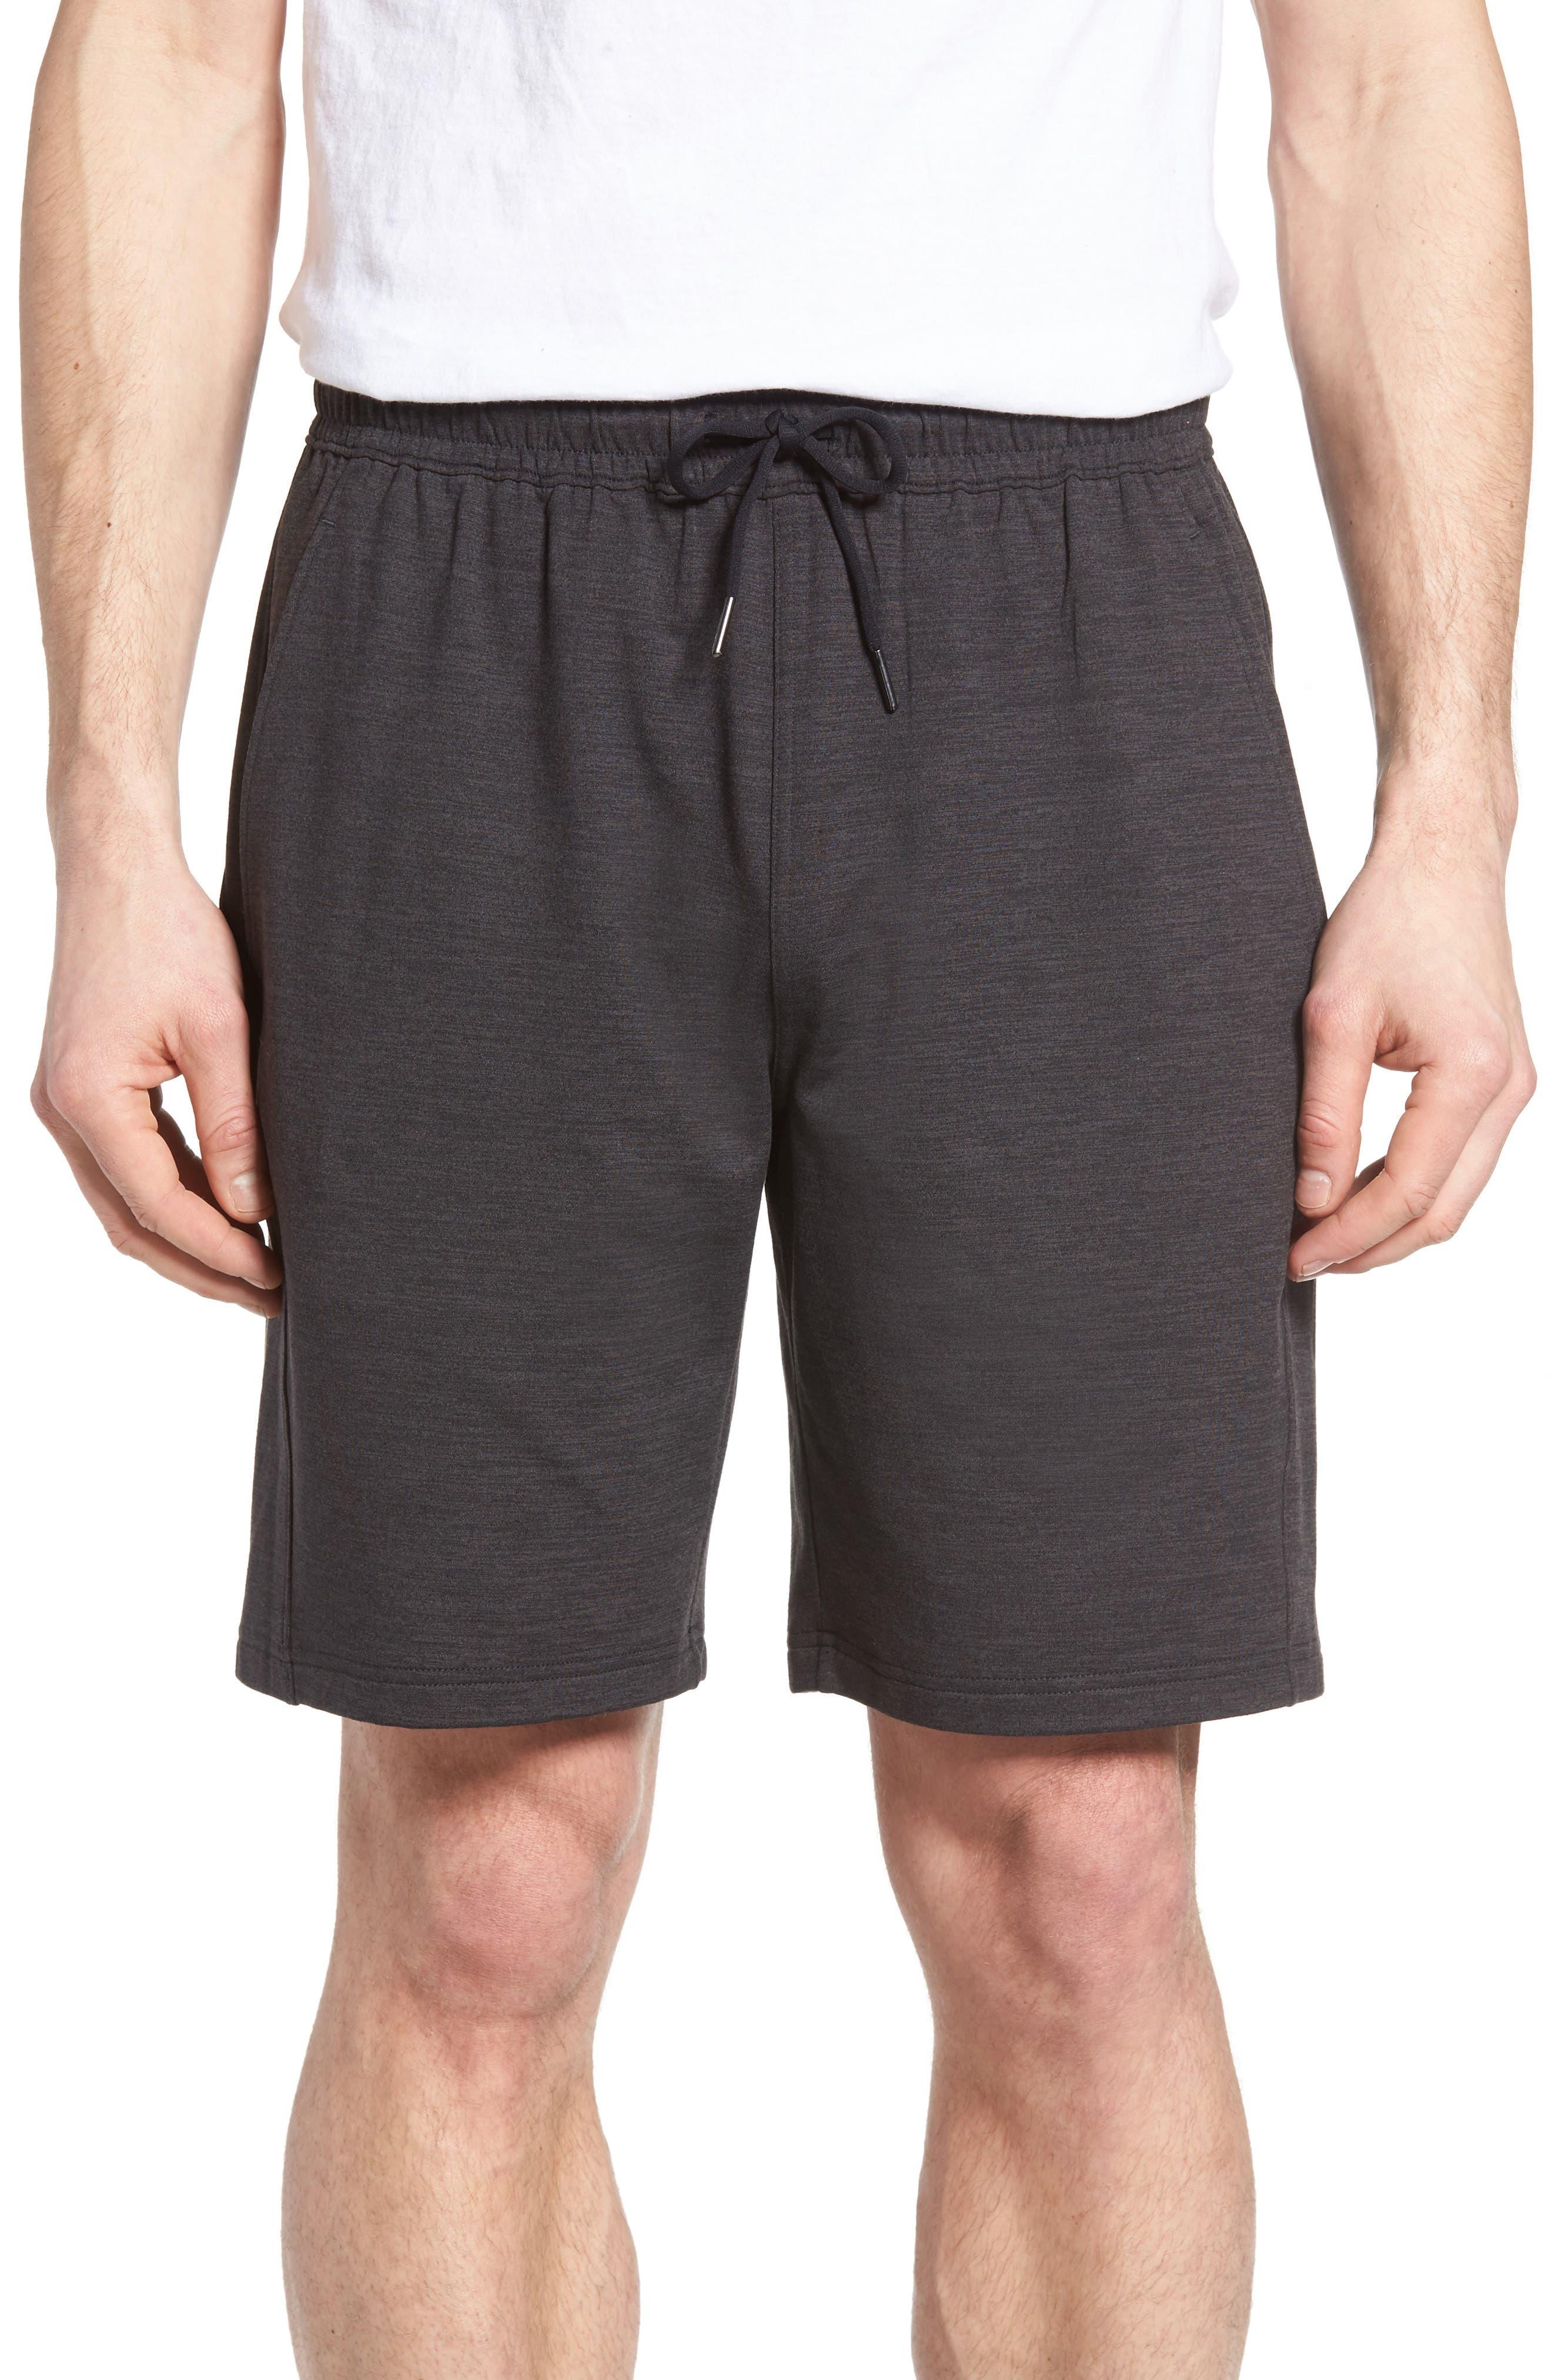 Pyrite Knit Shorts,                         Main,                         color, Black Oxide Melange